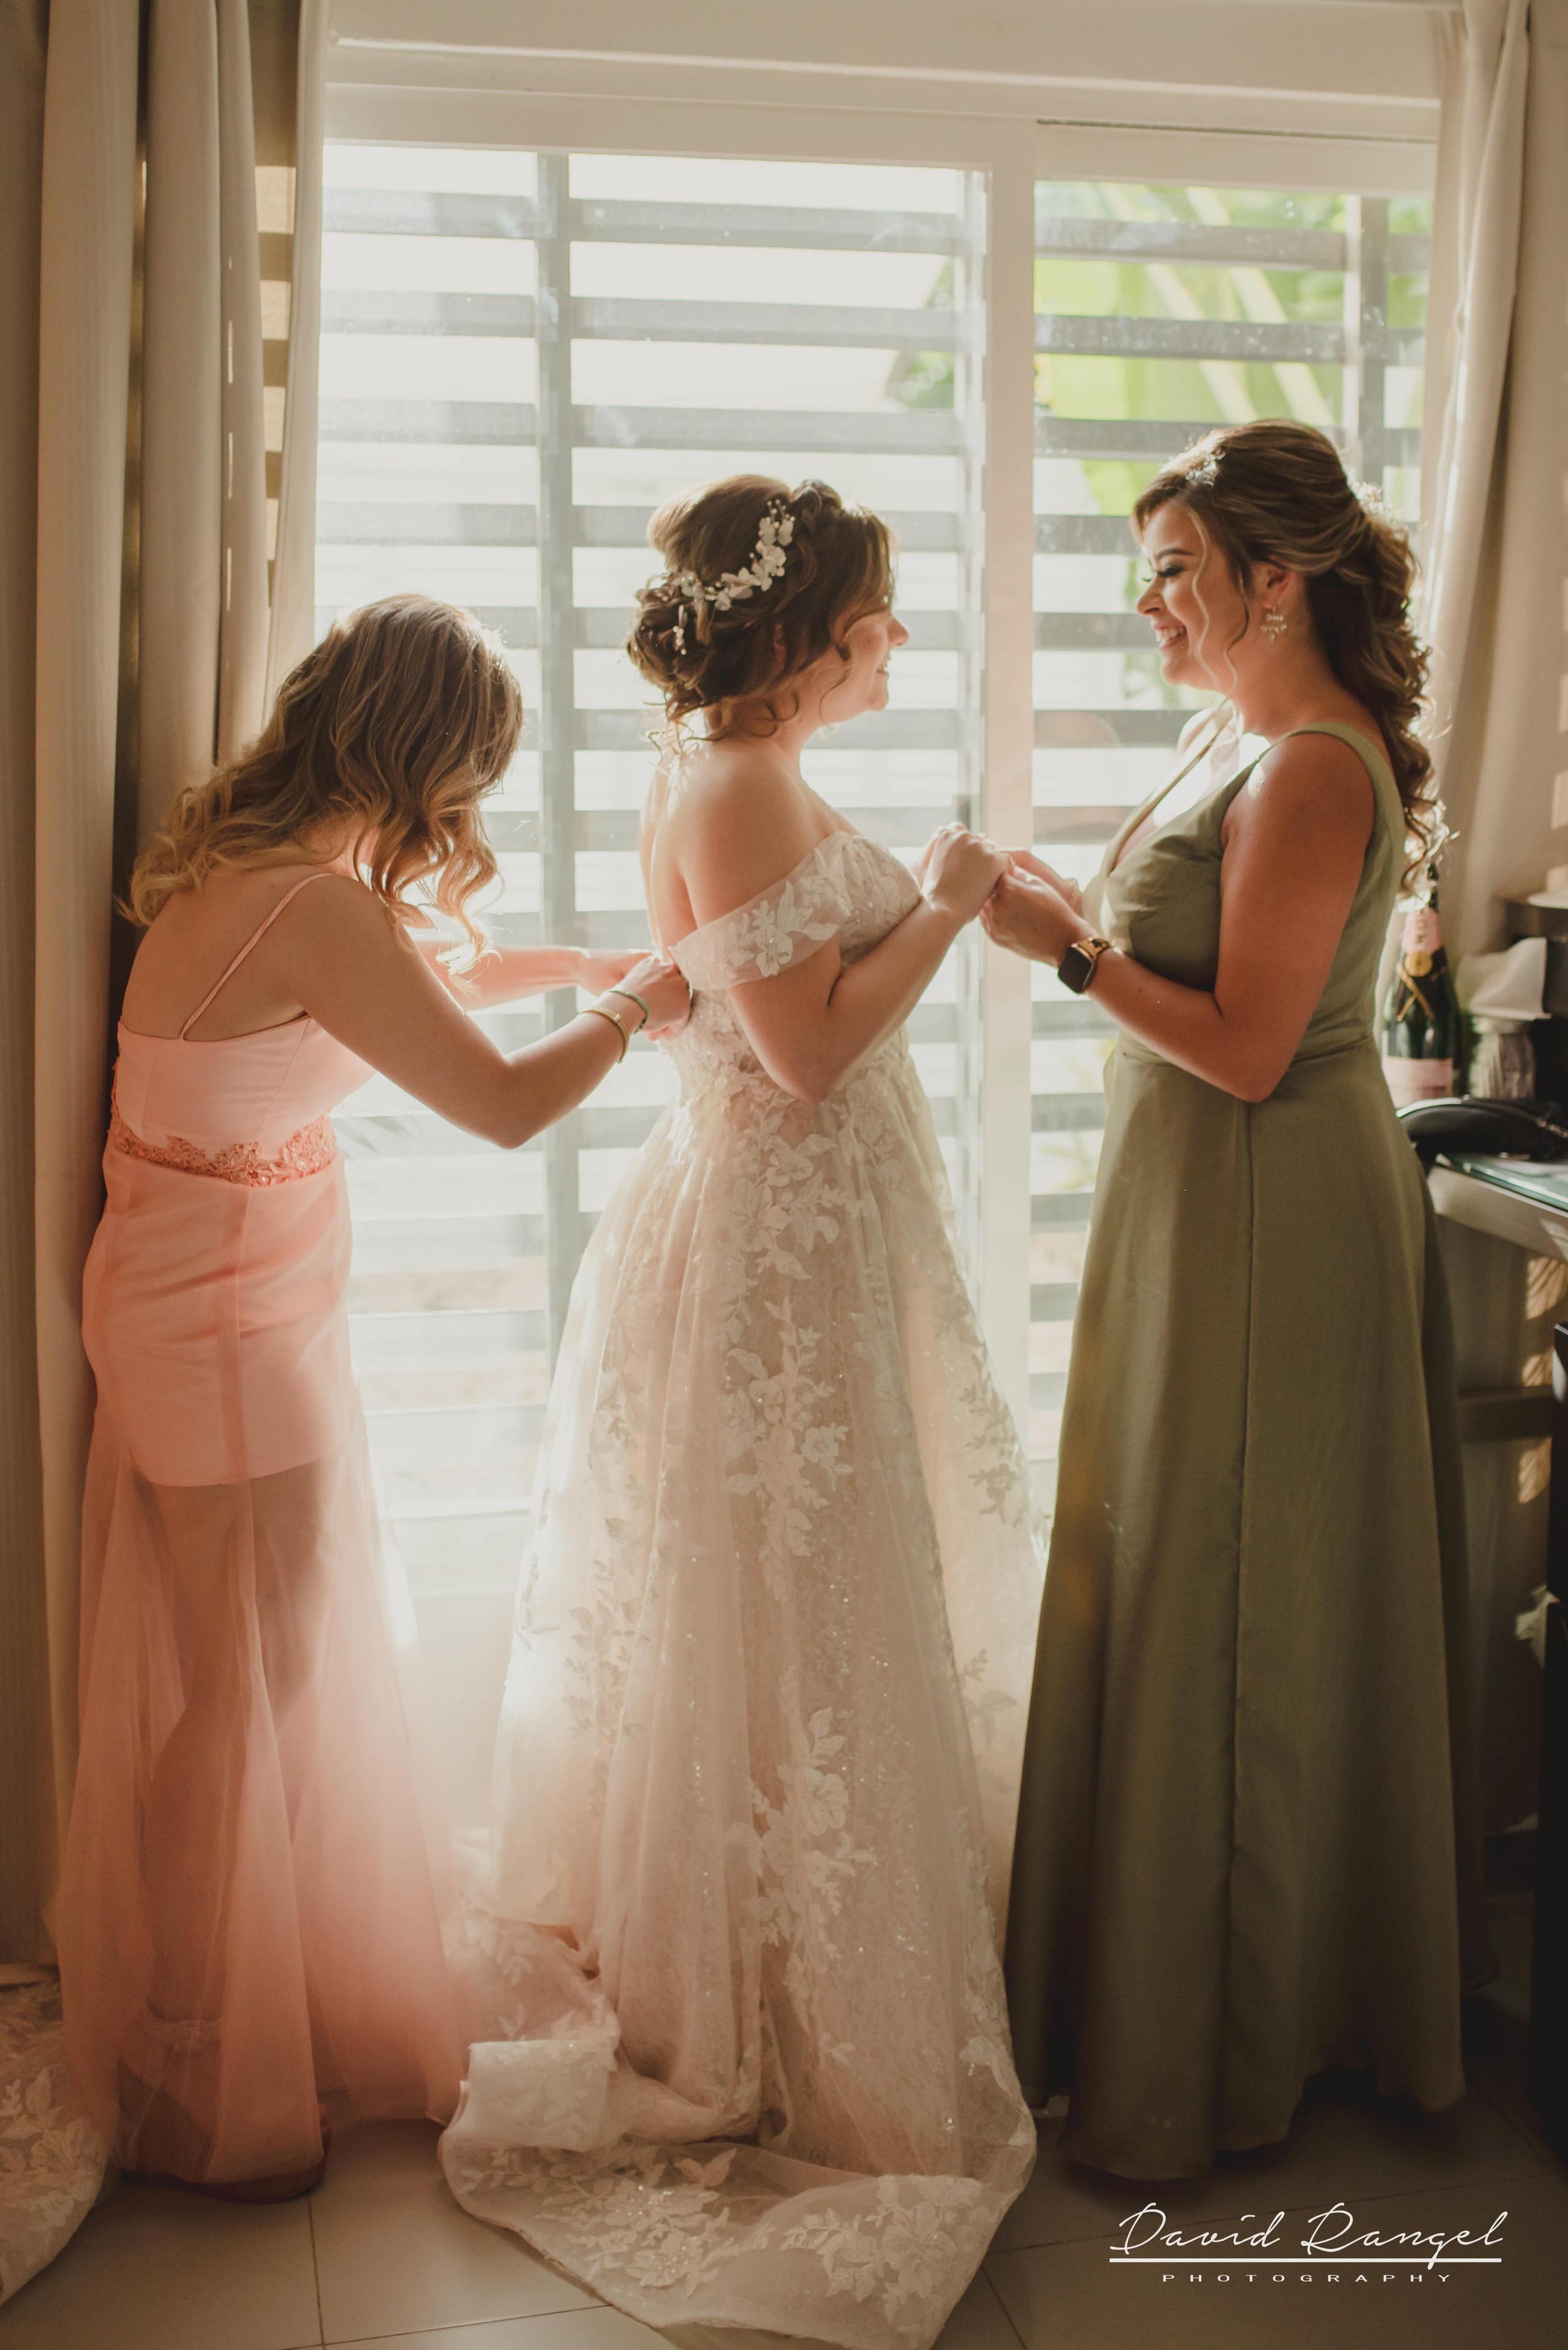 bride+getting+ready+shadow+earring++bathrobe+natural+ligh+photo+destination+wedding+isla+blanca+smile+mirror+photo+celebration+bridesmaids+sister+bestfriend+dress+wedding